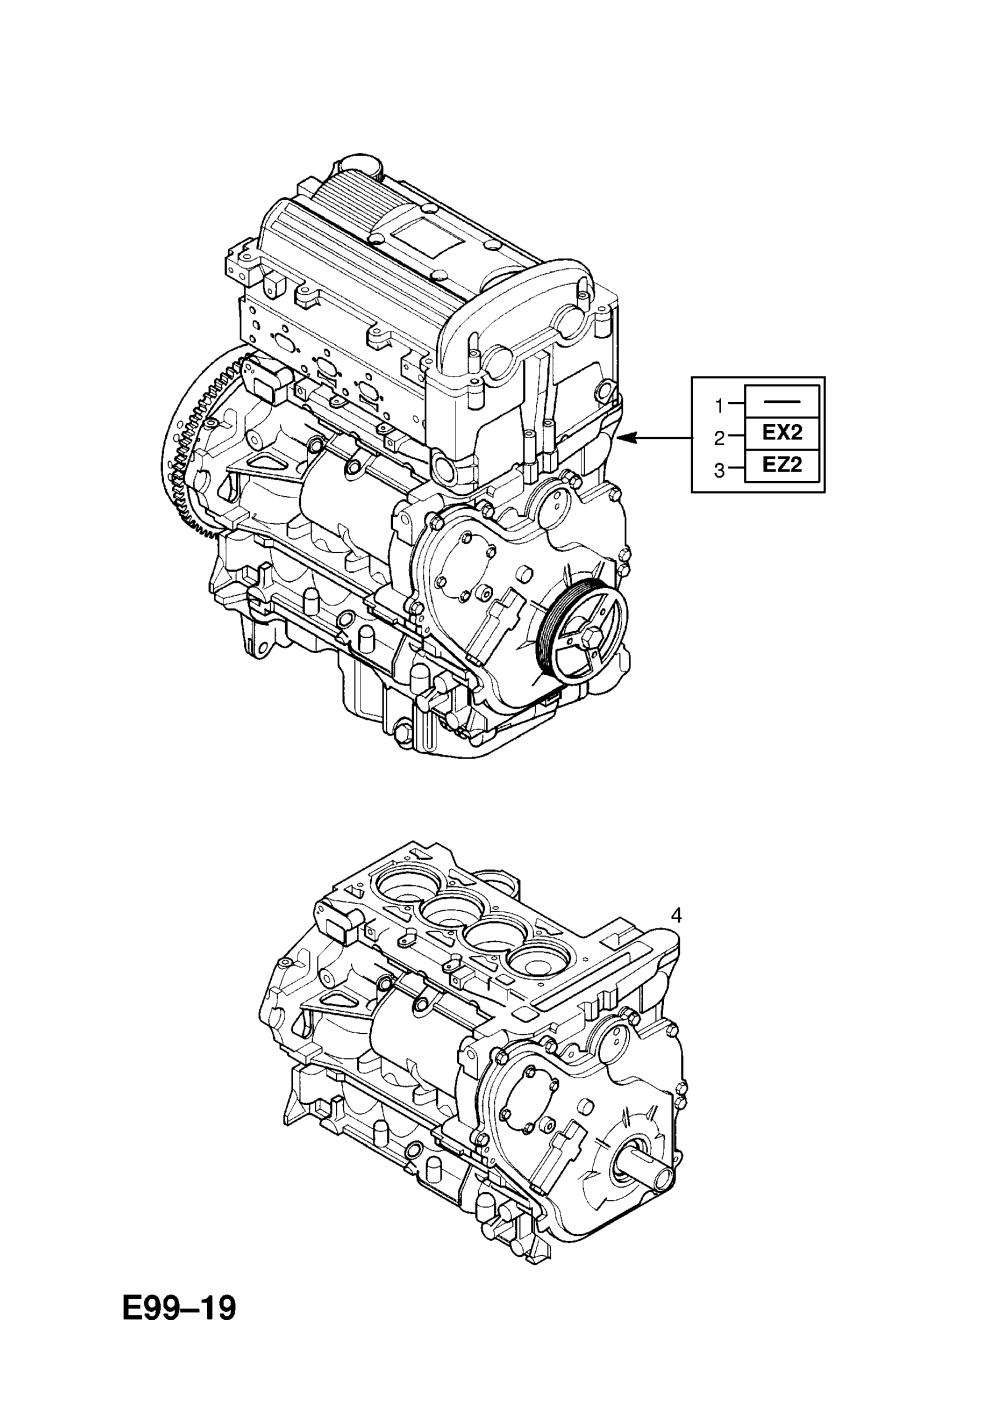 medium resolution of list of parts